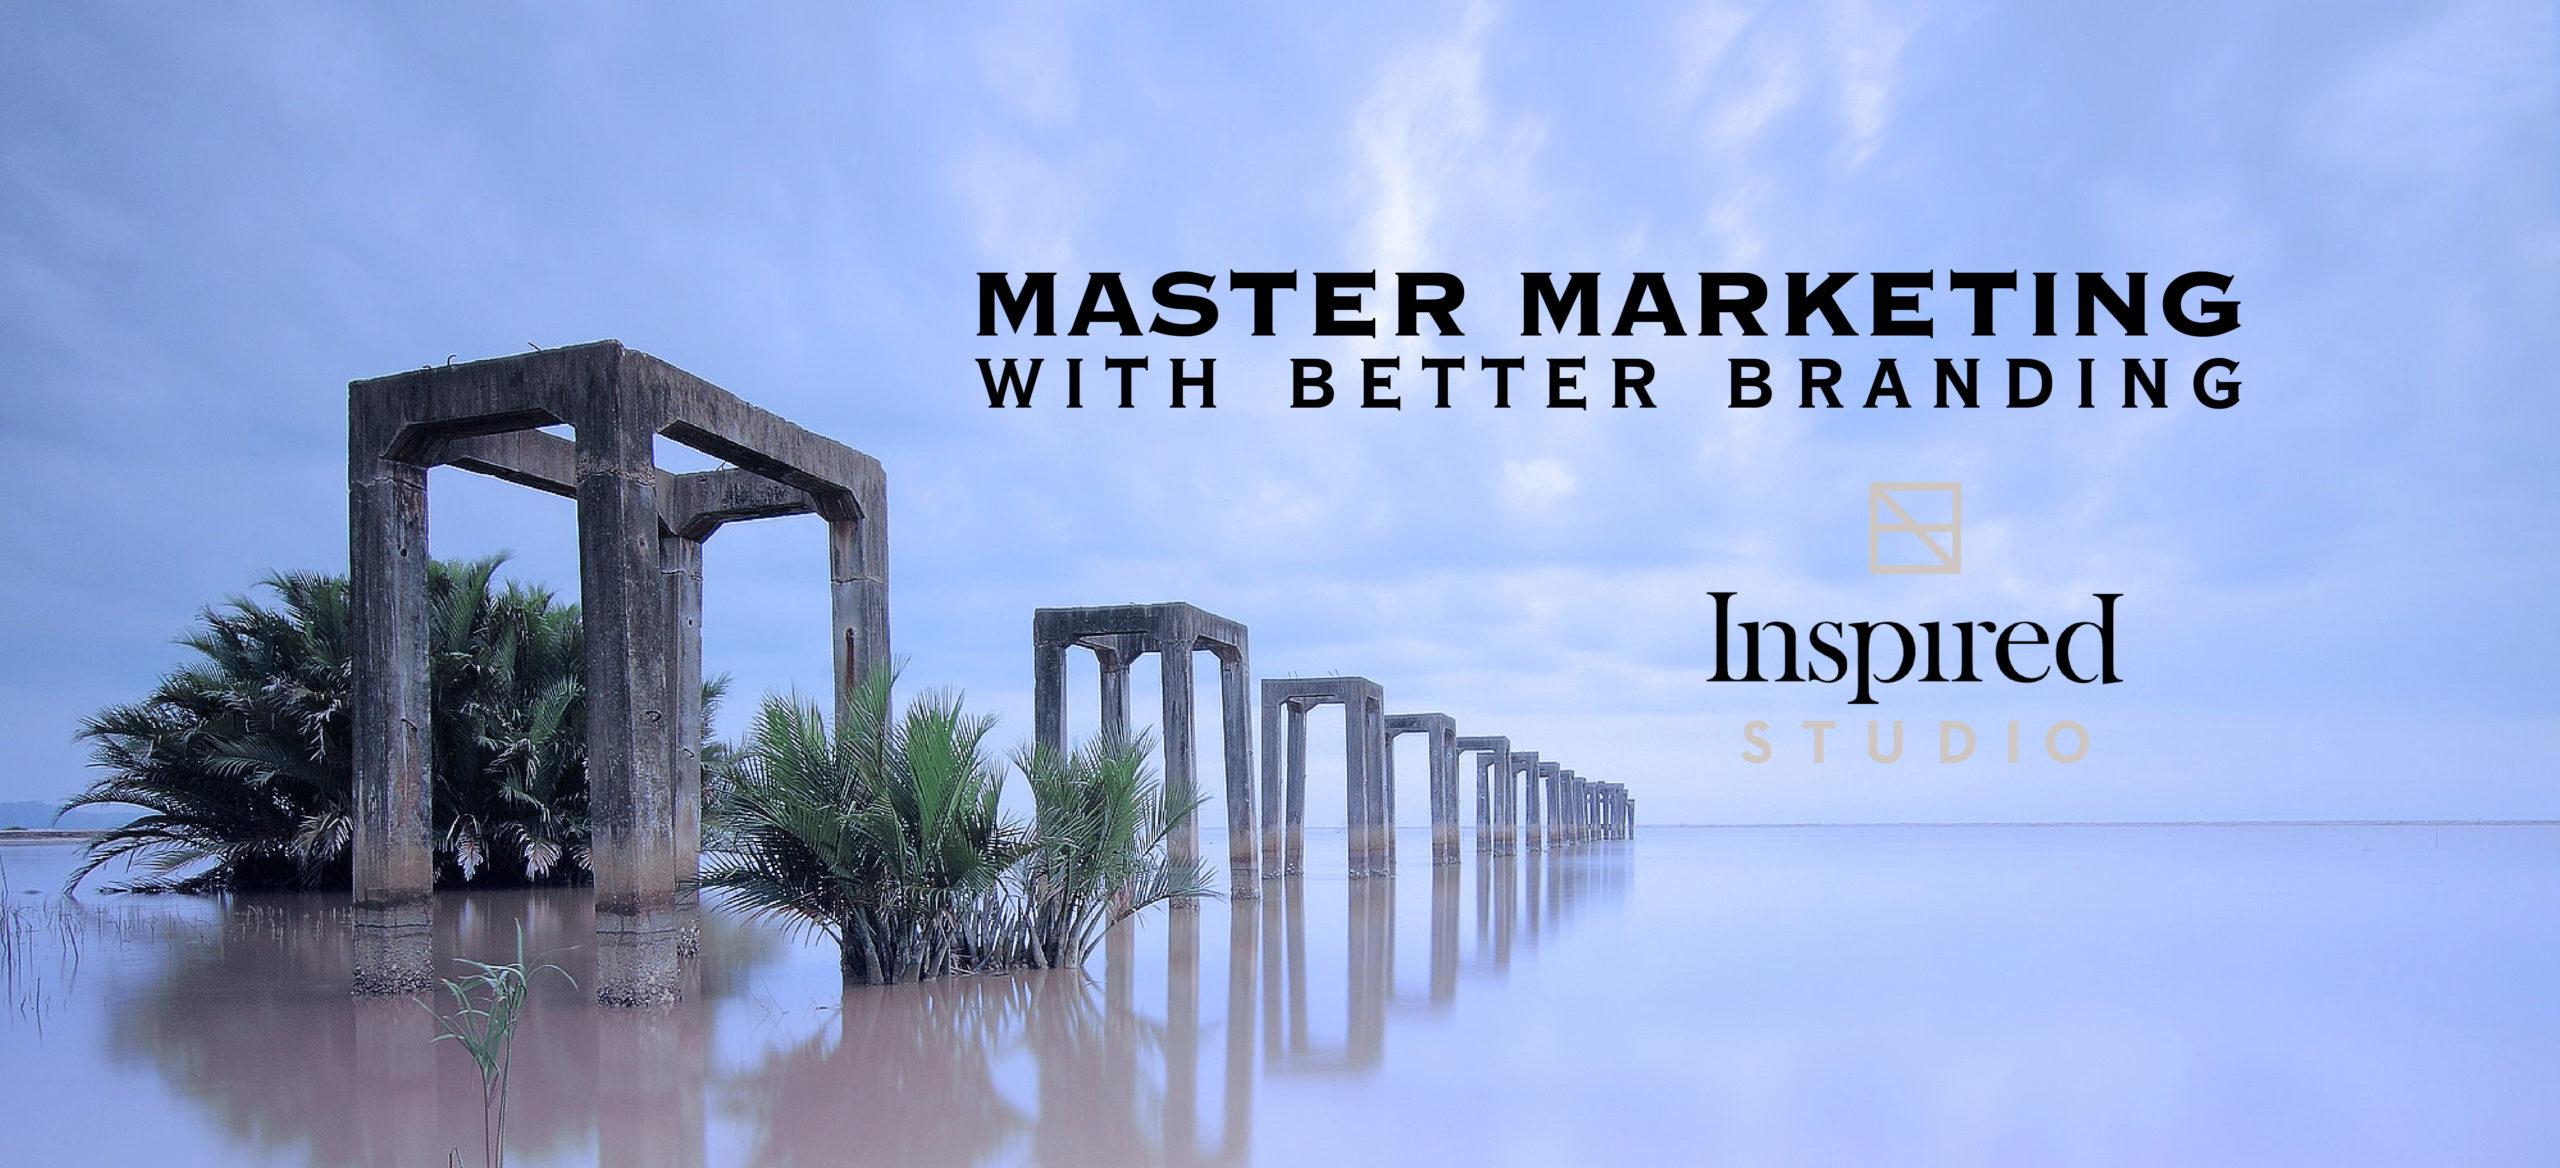 Master Marketing with Better Branding